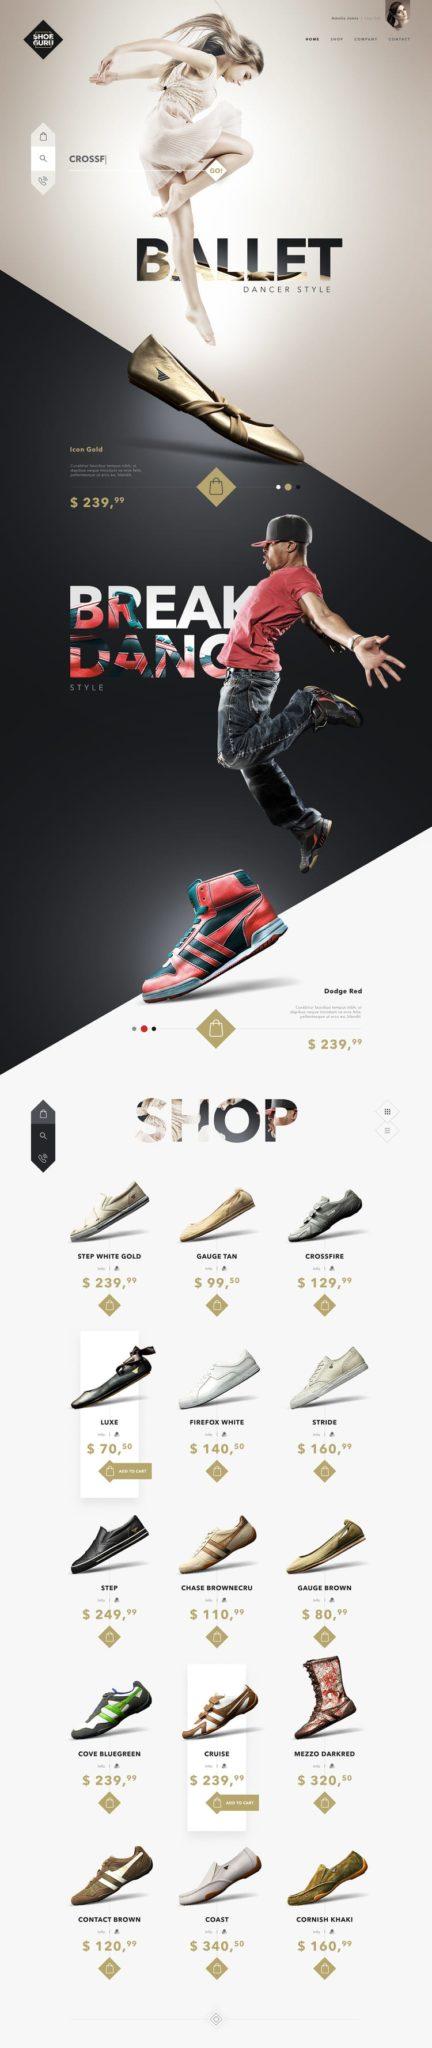 catalogue booklet lookbook design layout inspiration marketing catalogue catalog fashion shoes retail shoe guru shop newsletter design